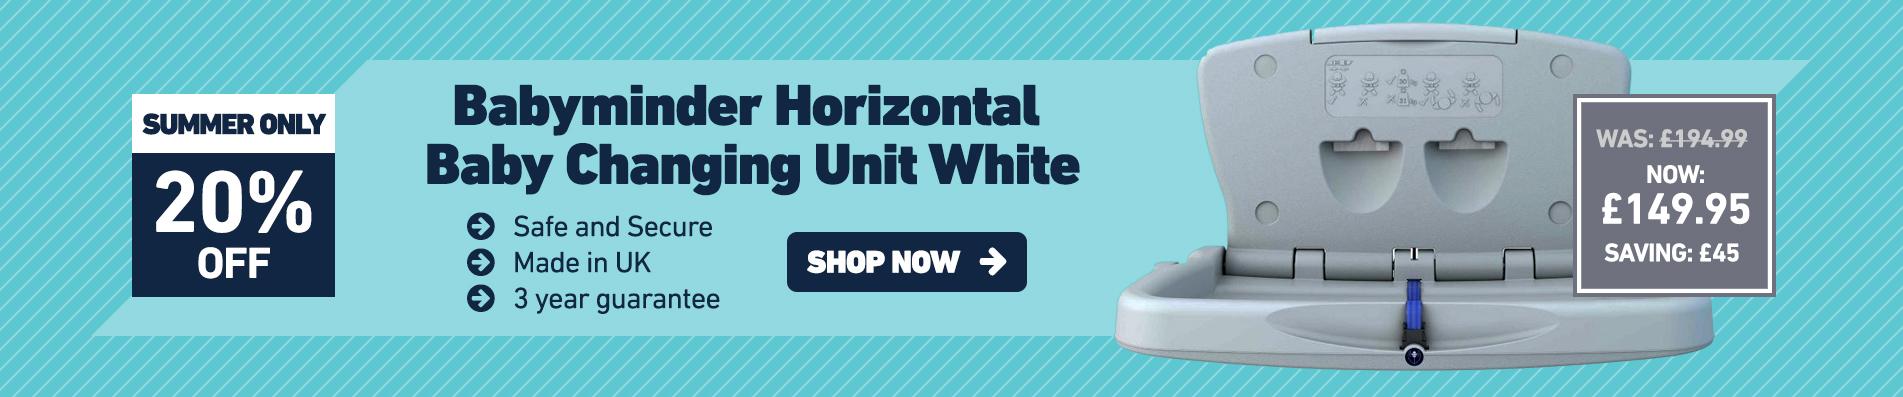 Babyminder Horizontal Baby Changing Unit White - NOW: £149.95